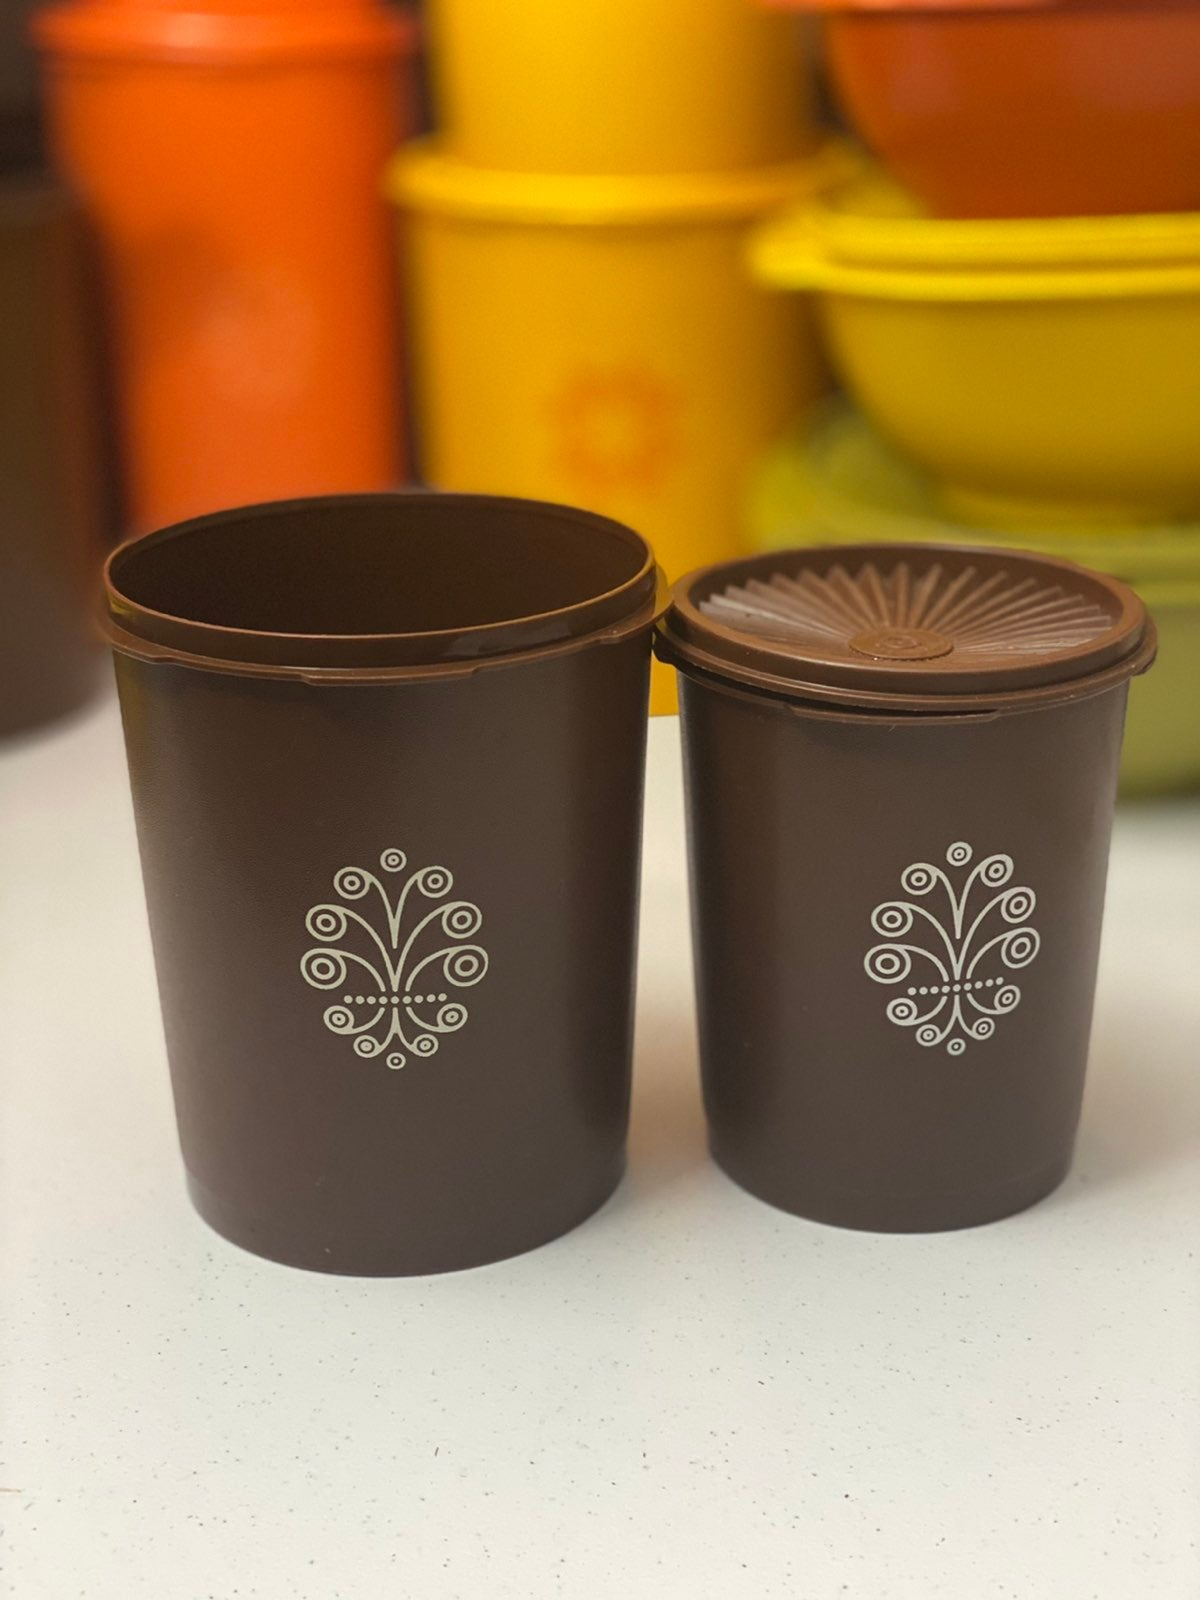 Vintage Tupperware Servalier Canisters